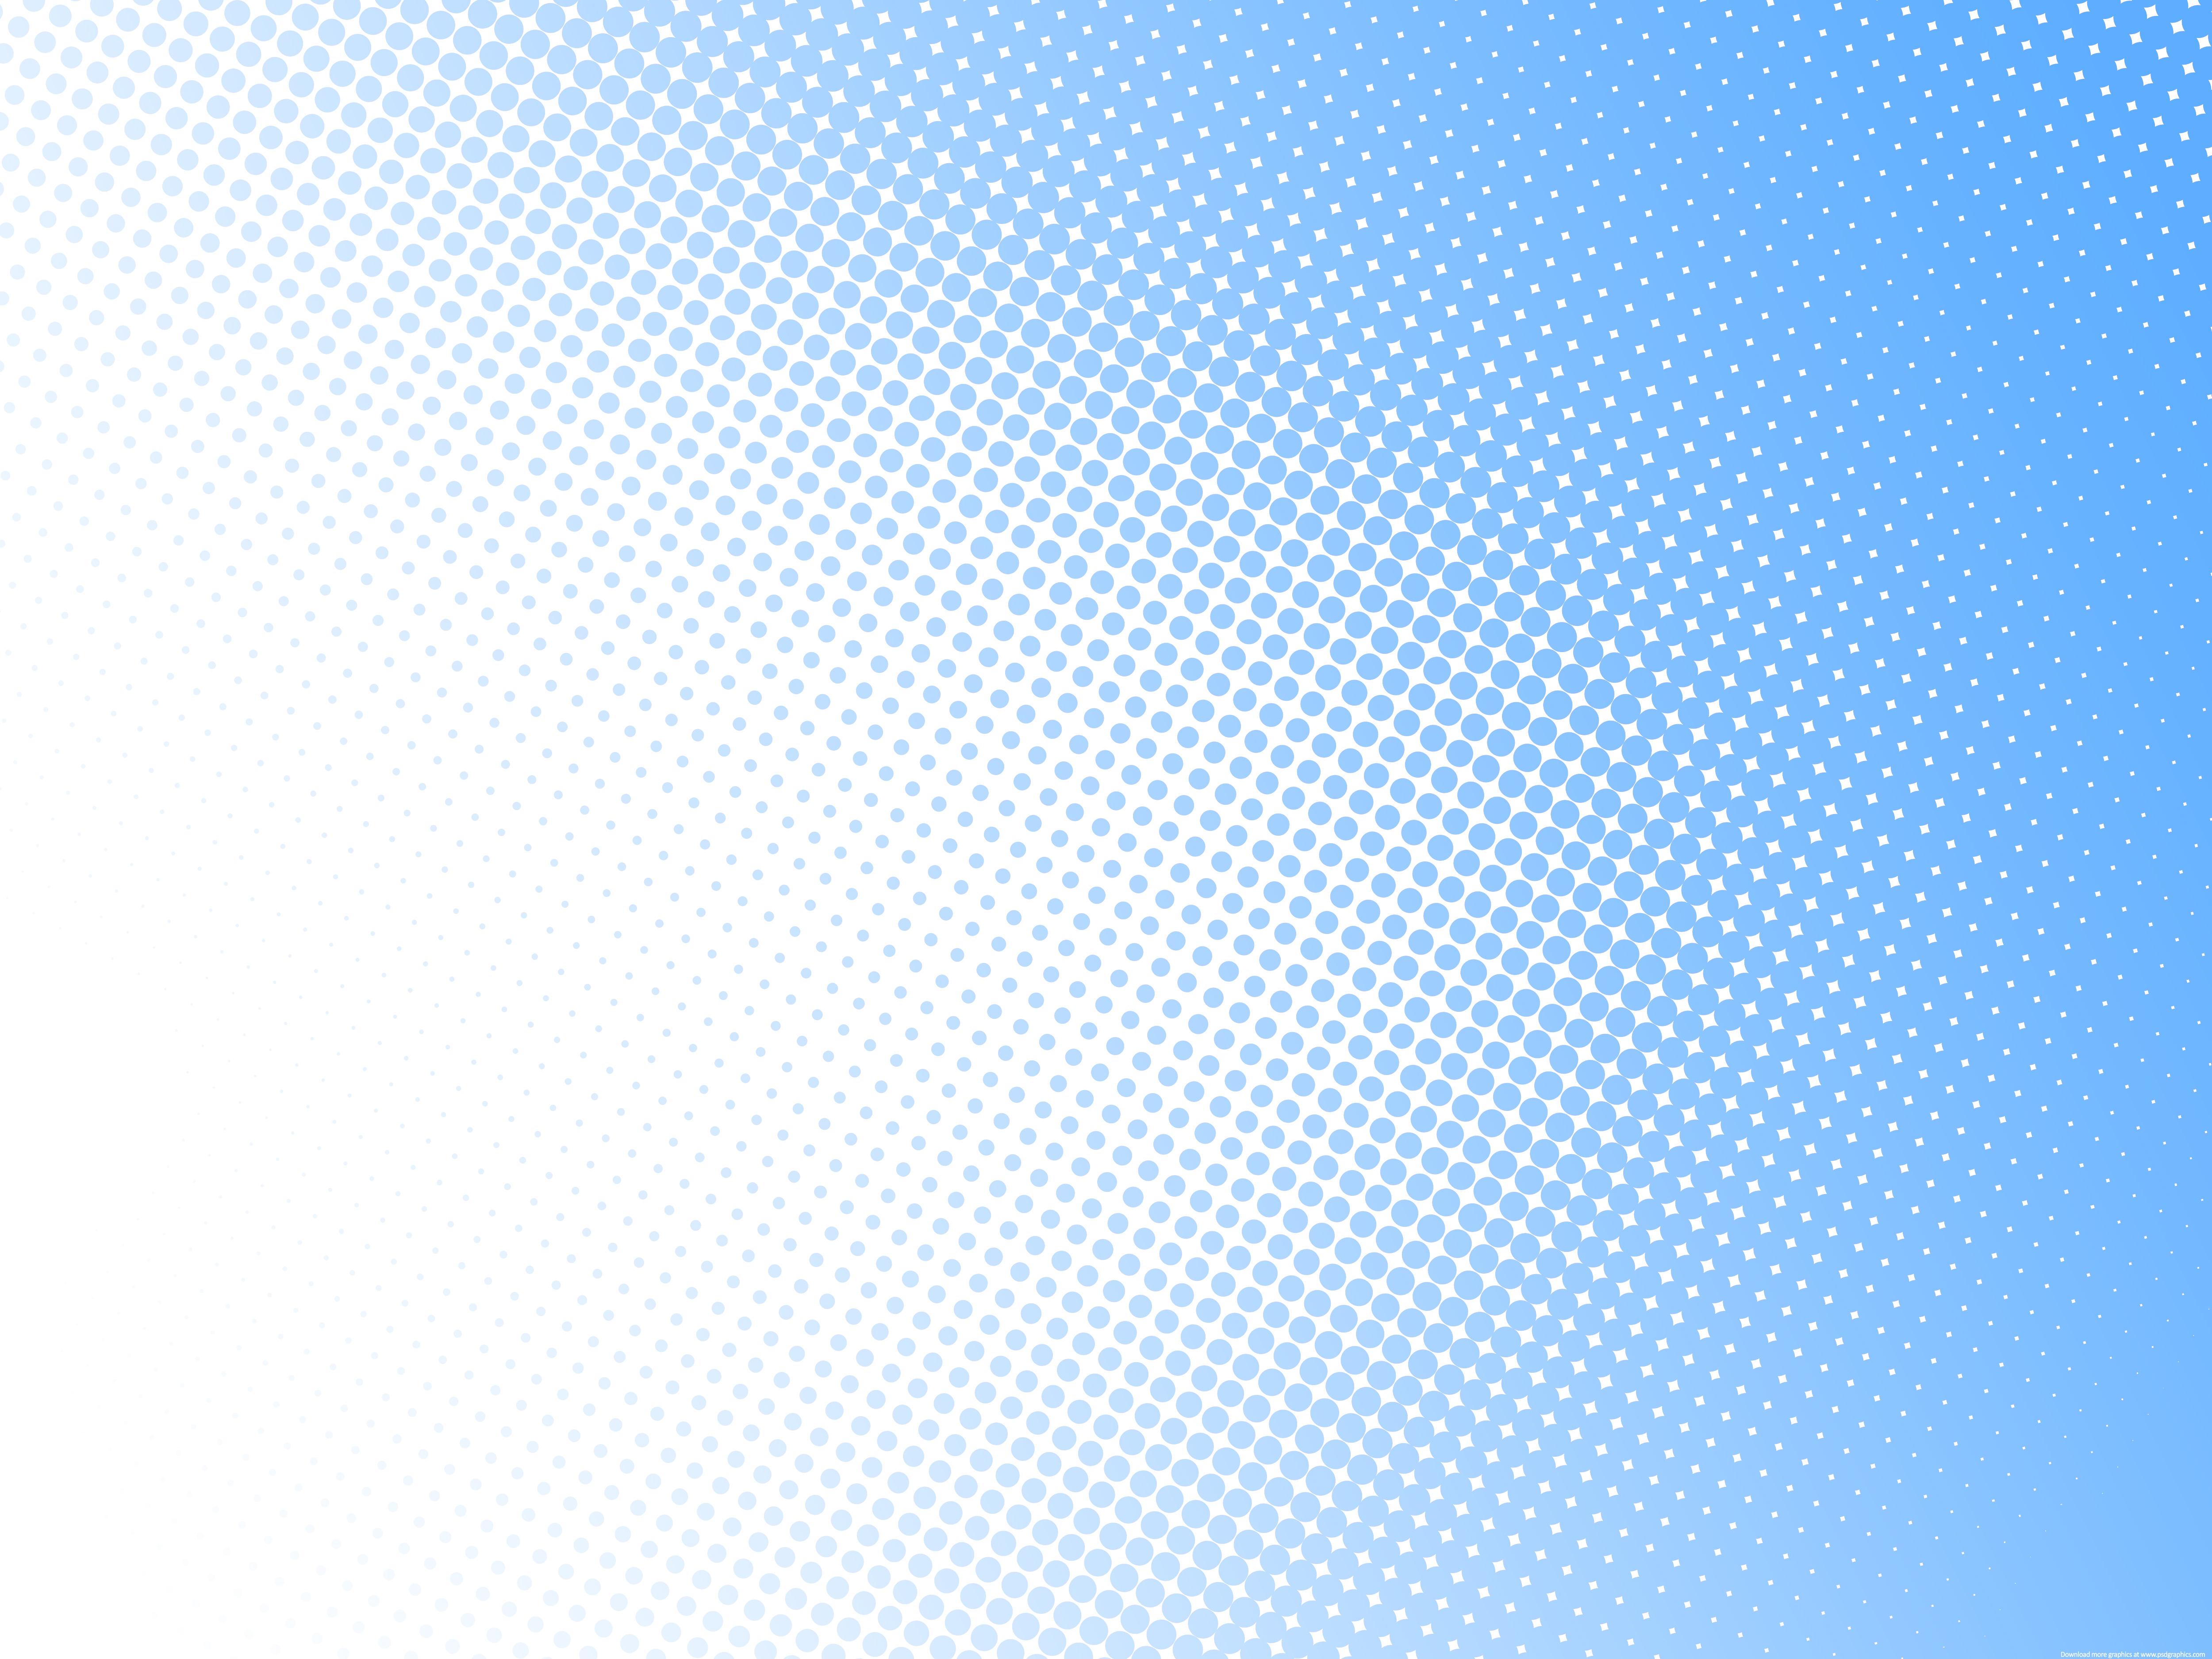 Light blue halftone pattern PSDGraphics 5000x3750